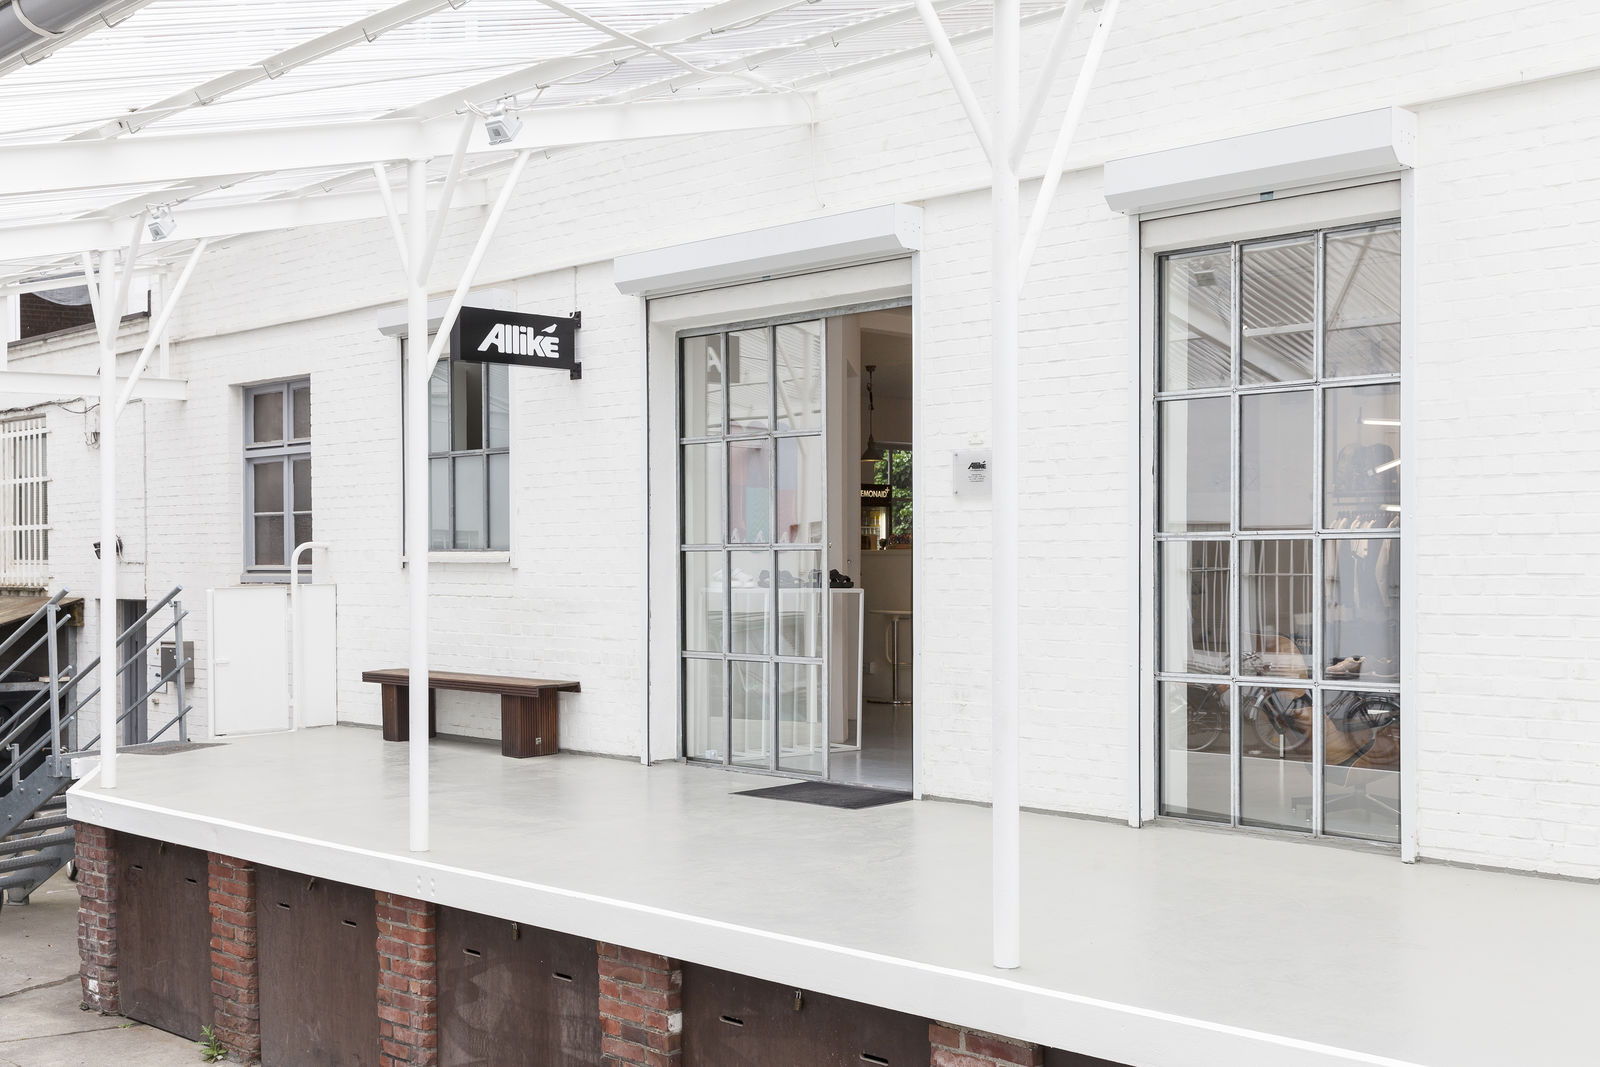 Allike Sneaker & Concept Store in Hamburg (Bild 2)